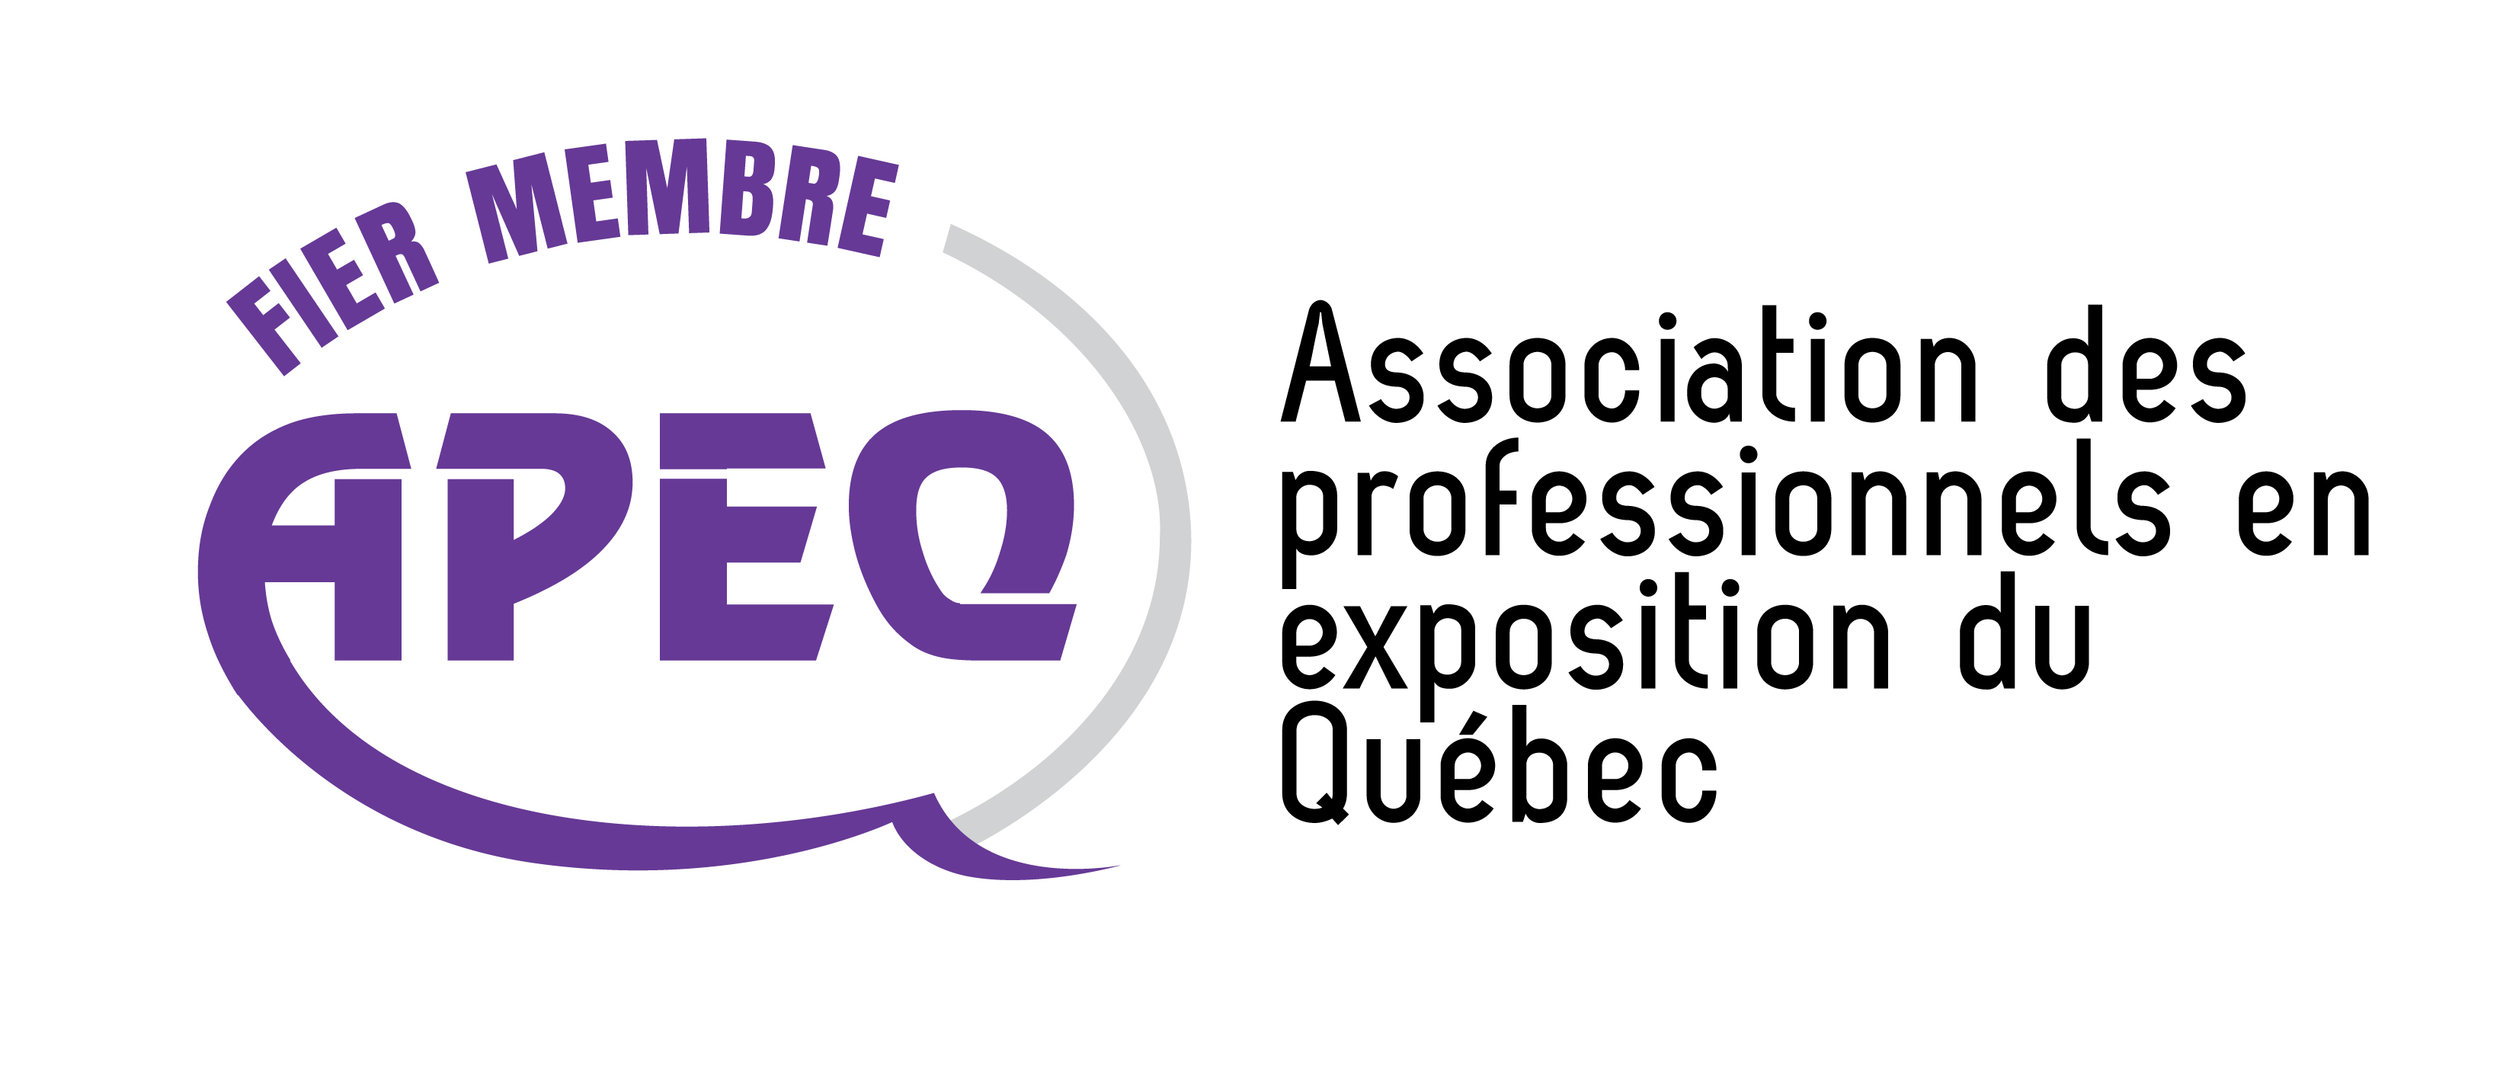 Logo Fier membre APEQ.jpg